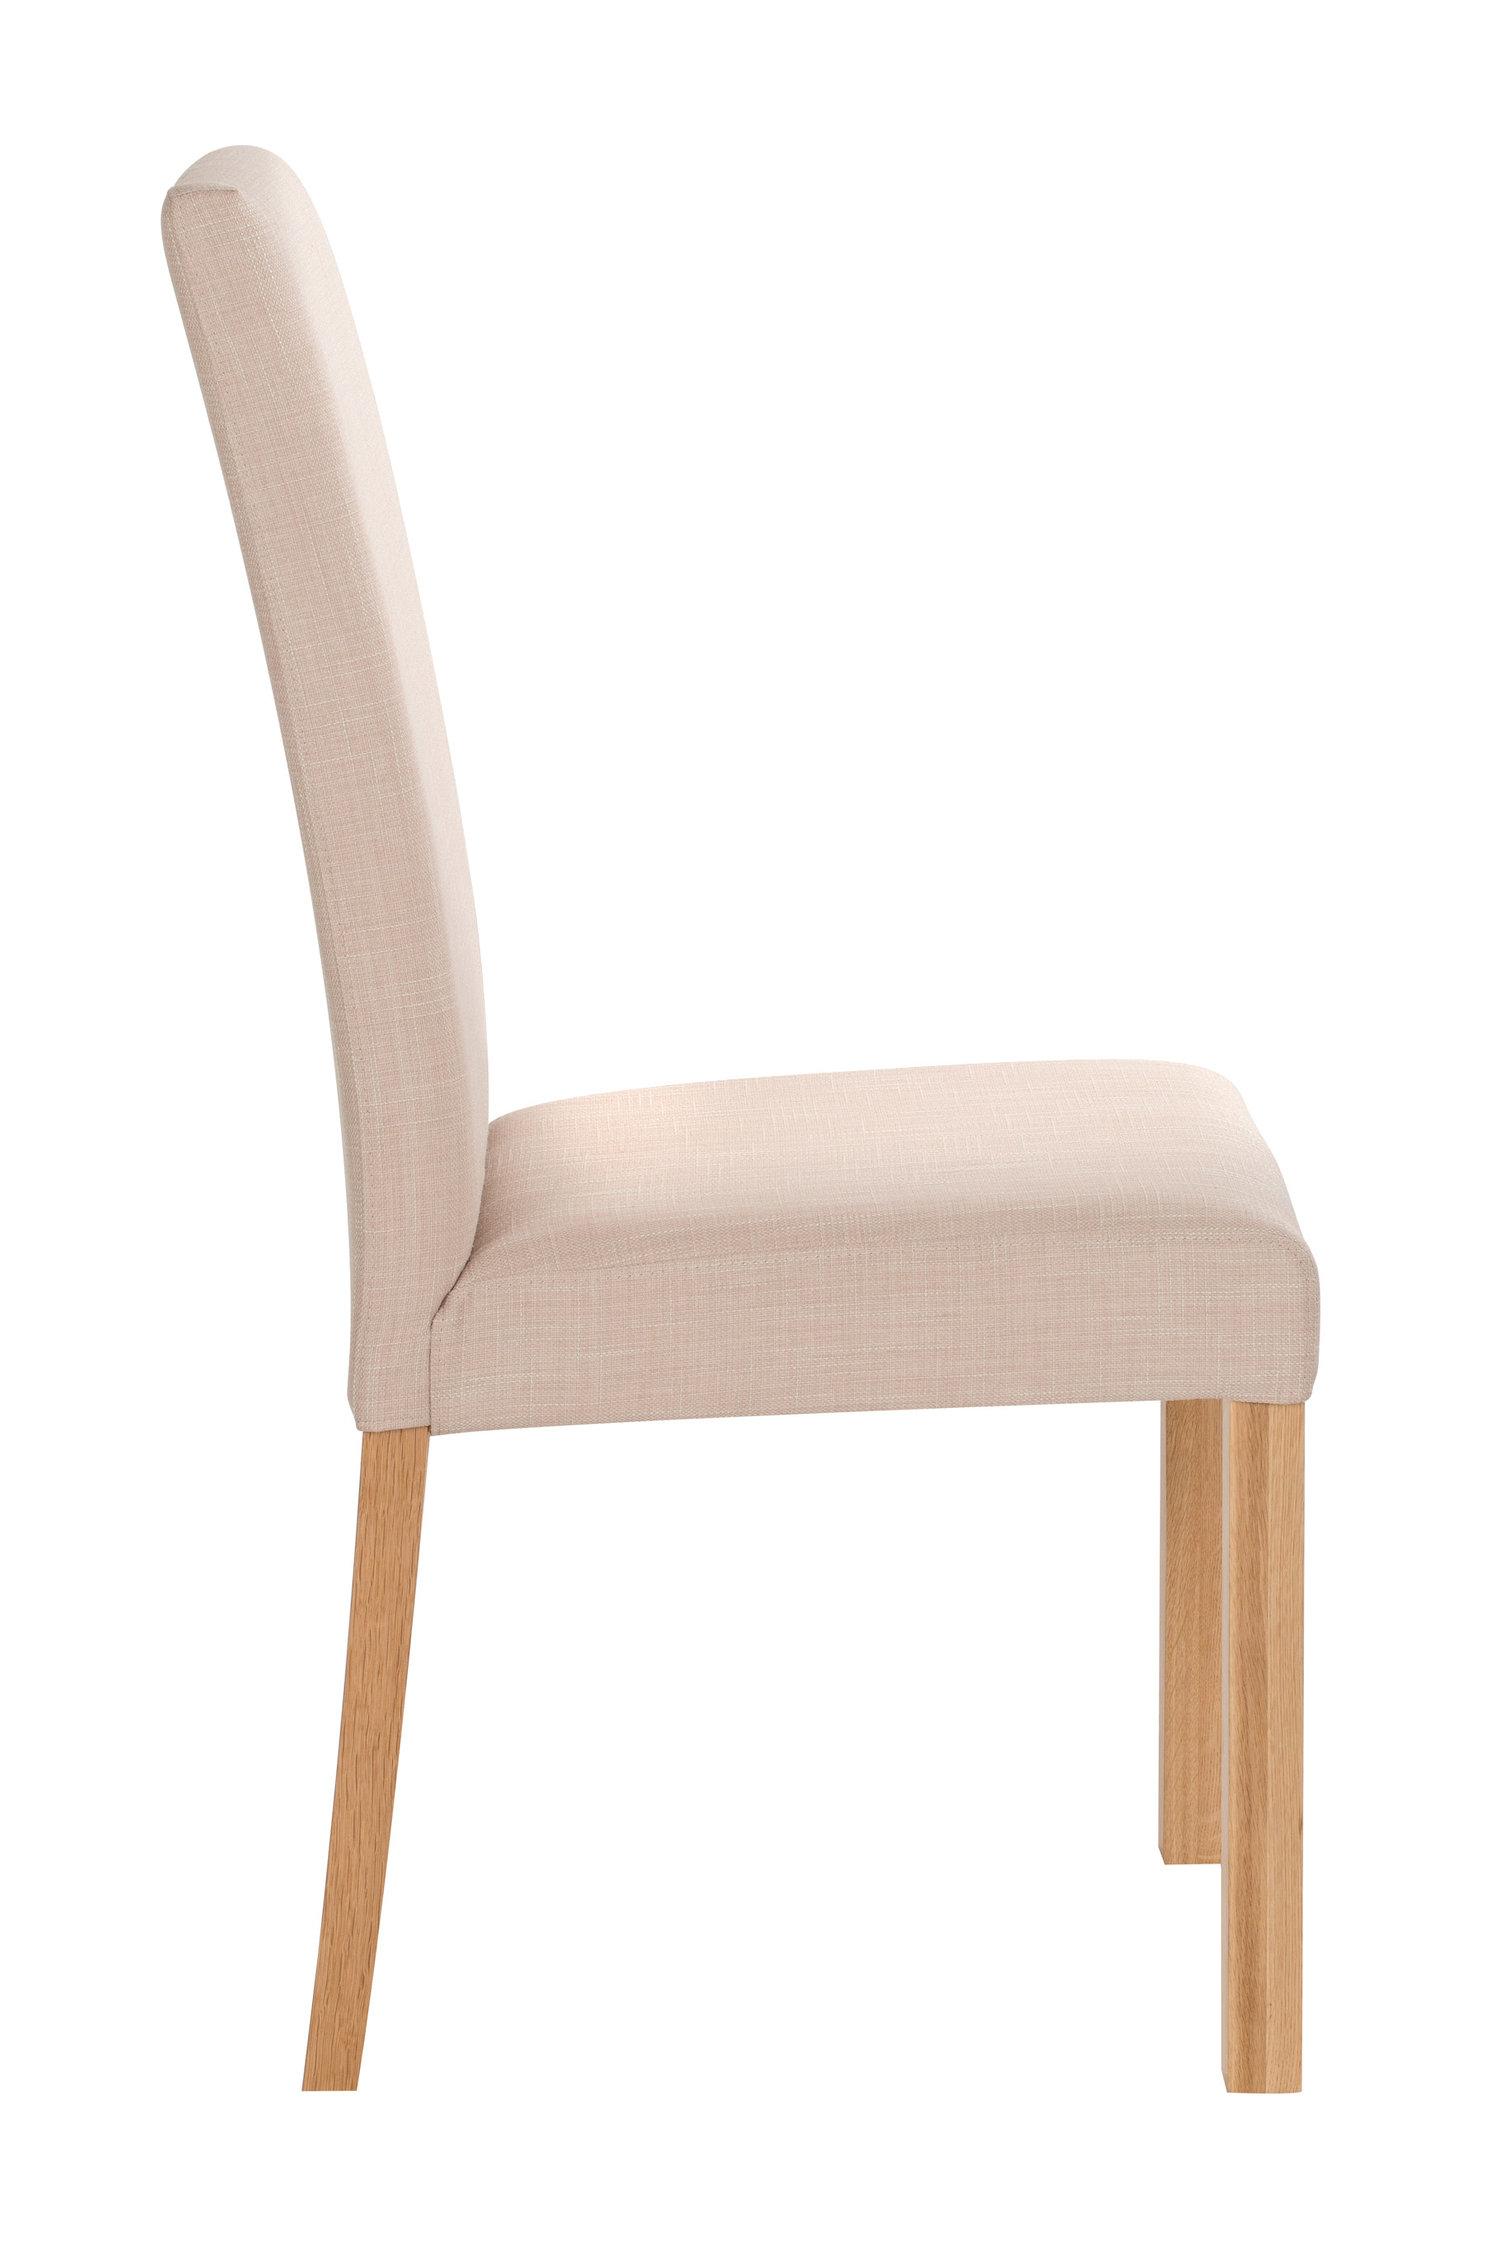 Simple_Furniture_product_TBP_1.jpg